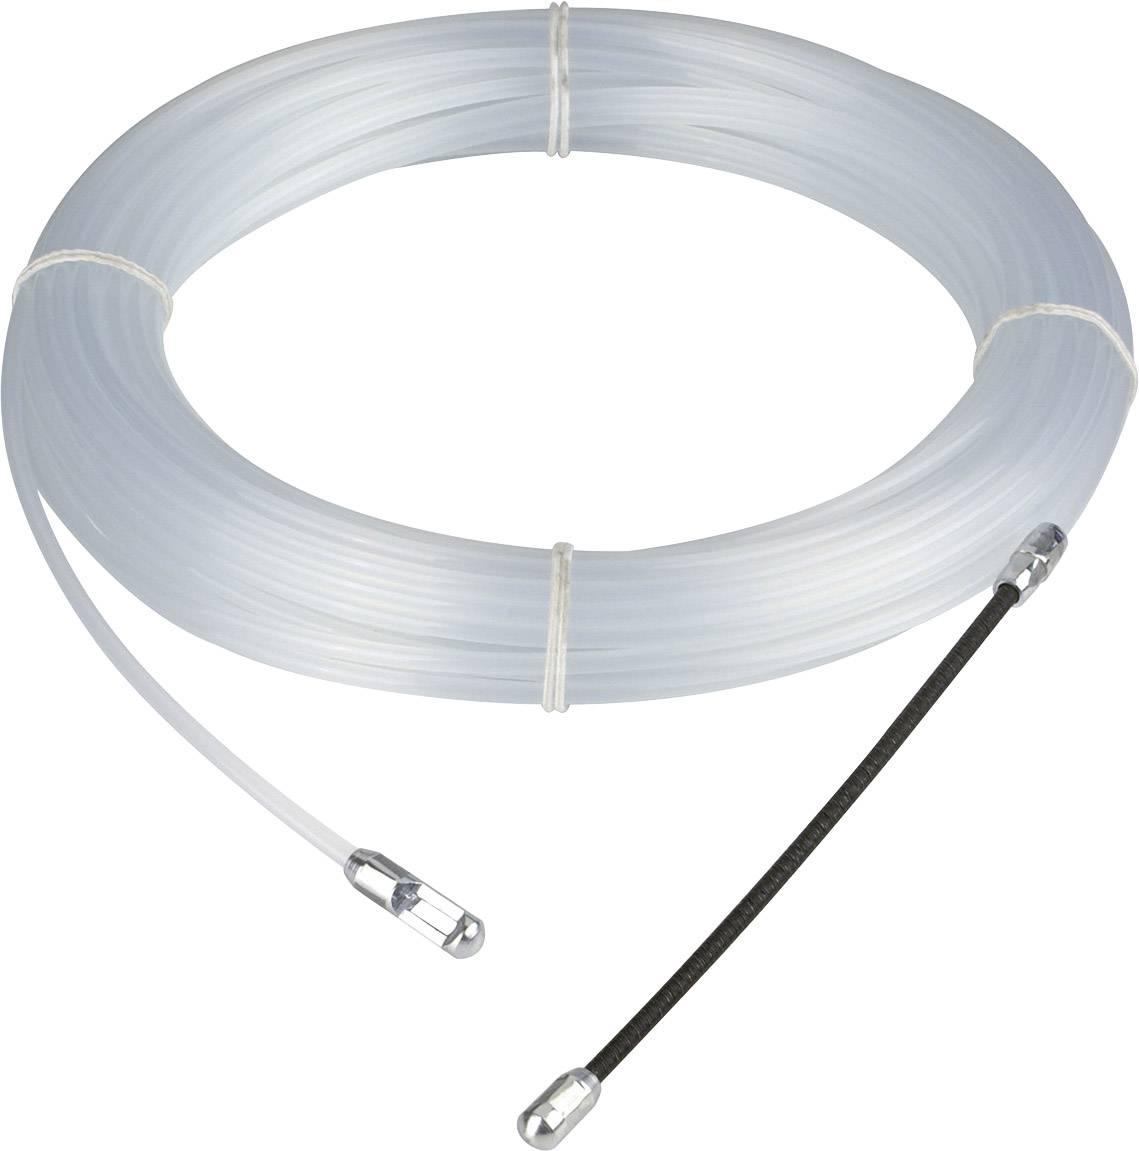 PVC Cable puller spiral 20m 0579503555 REV 1 pc(s) | Conrad.com